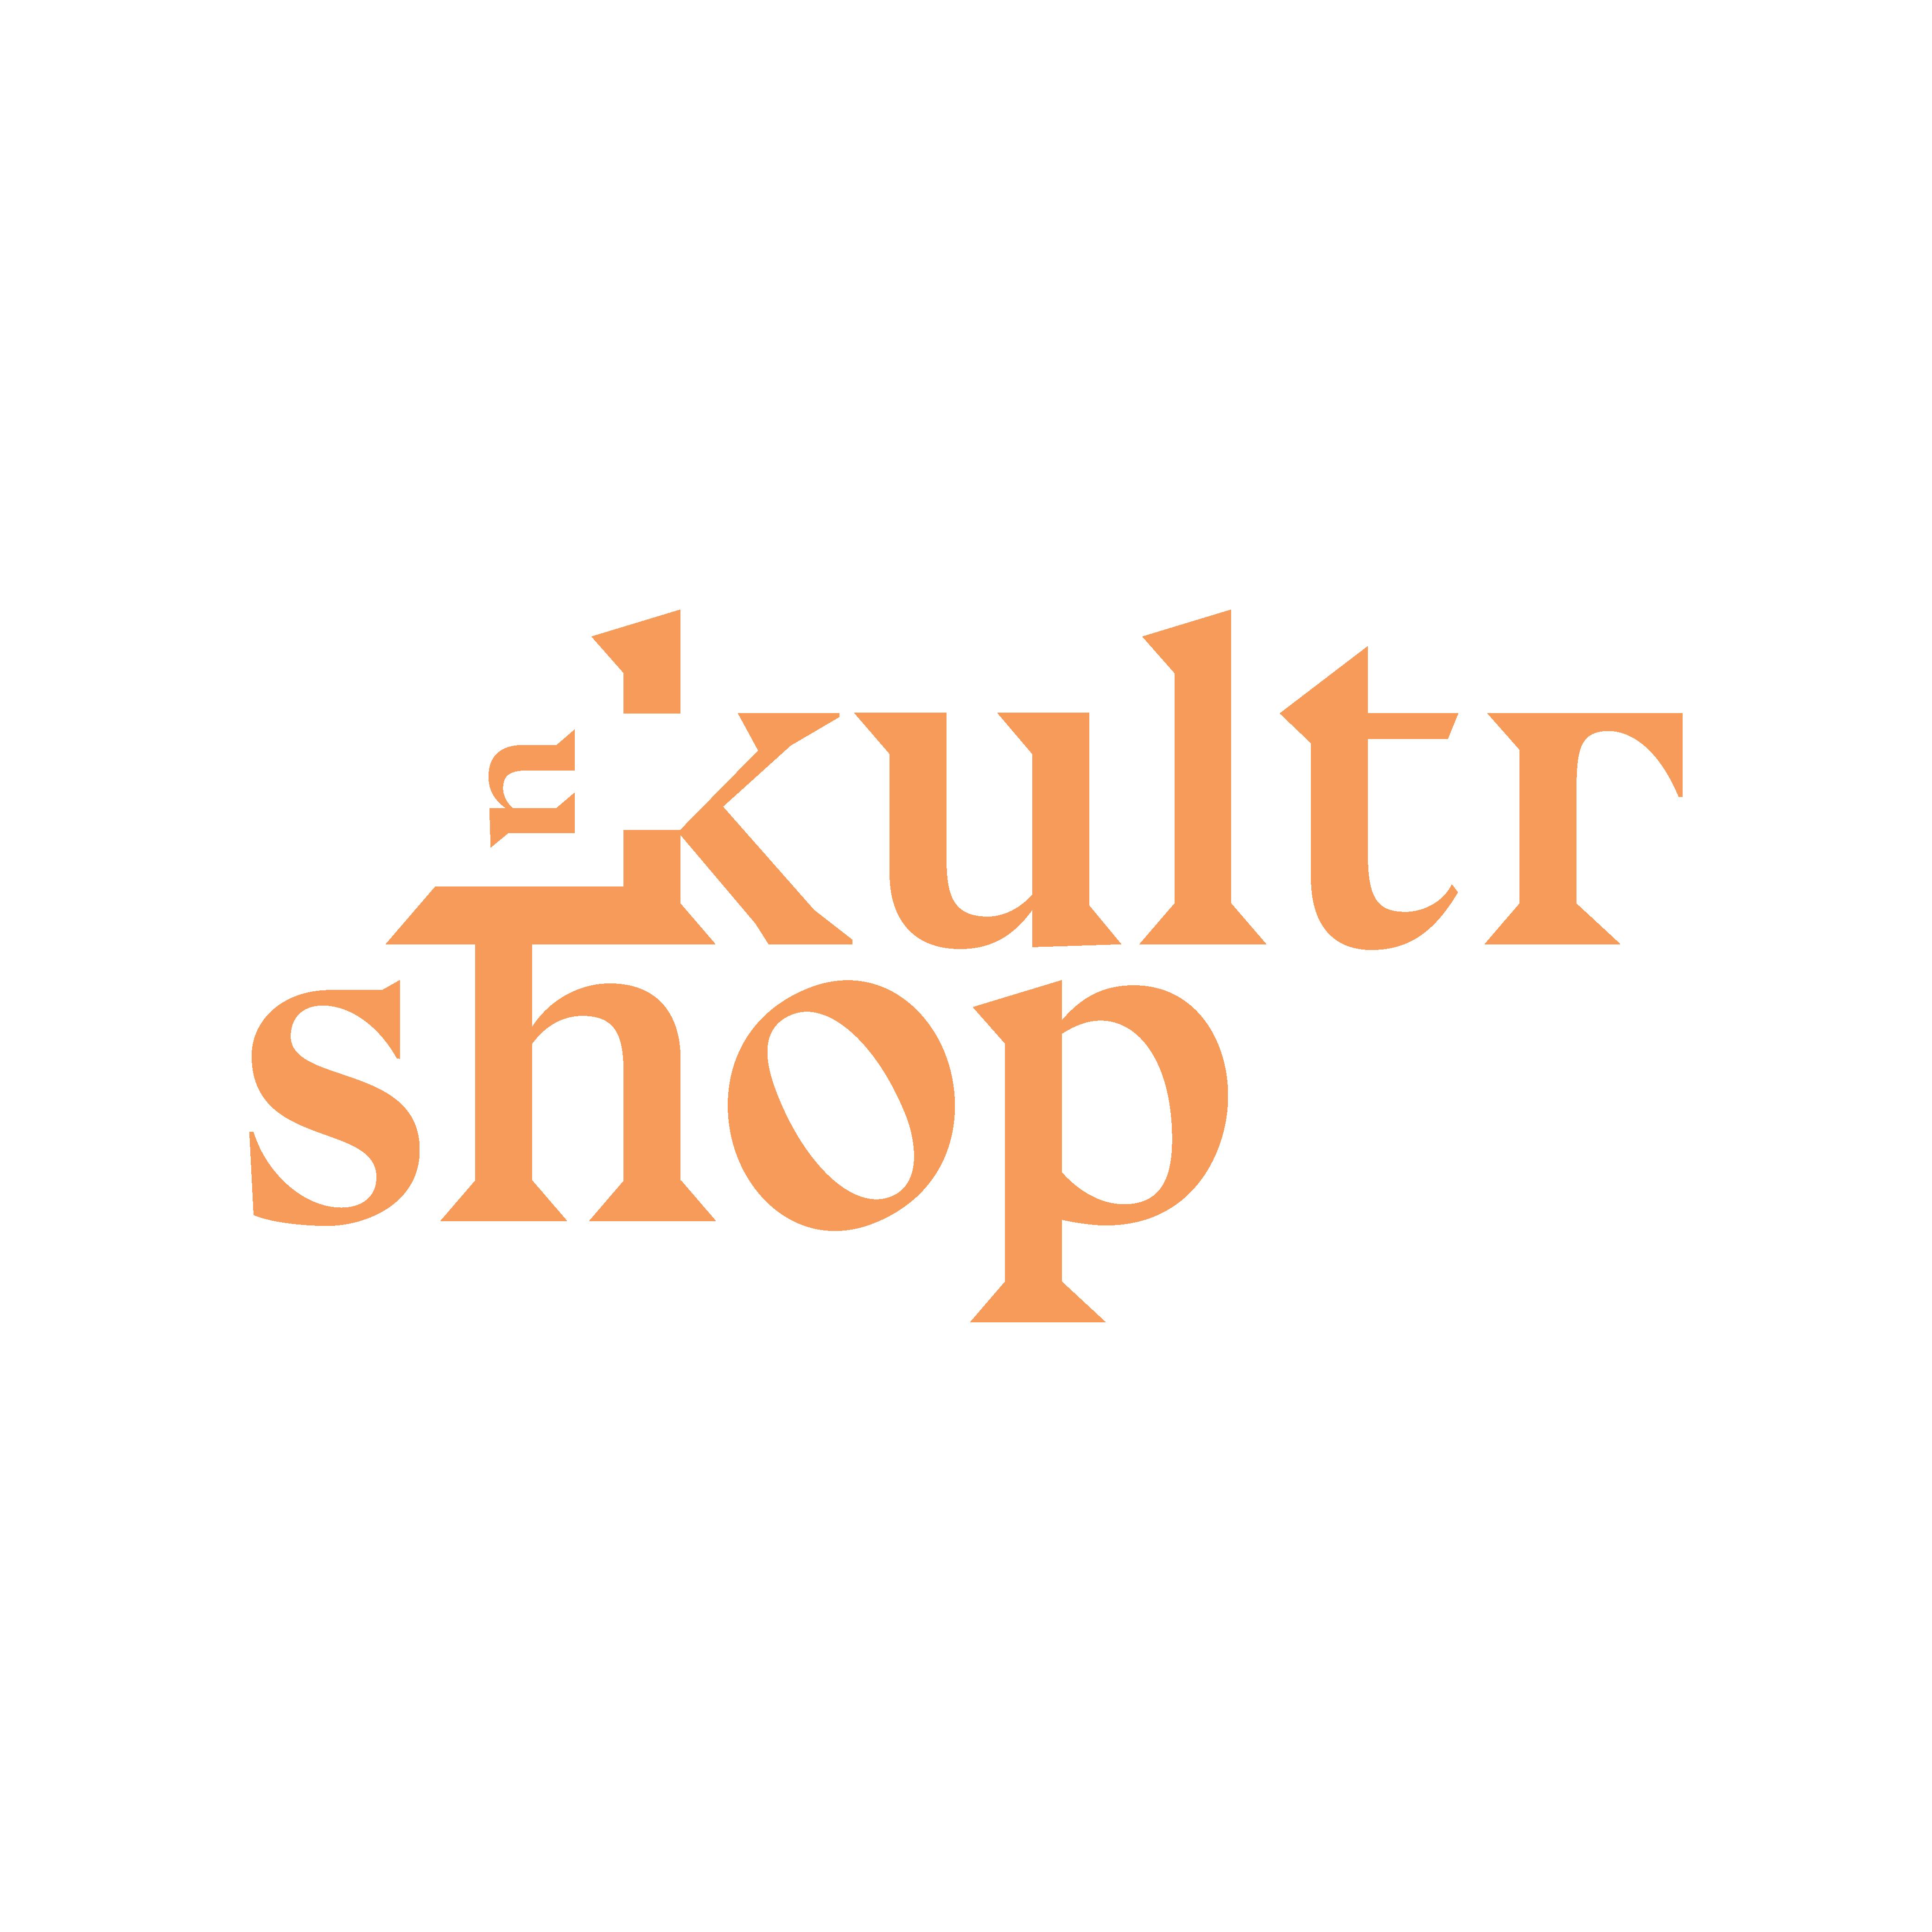 Kultrshop